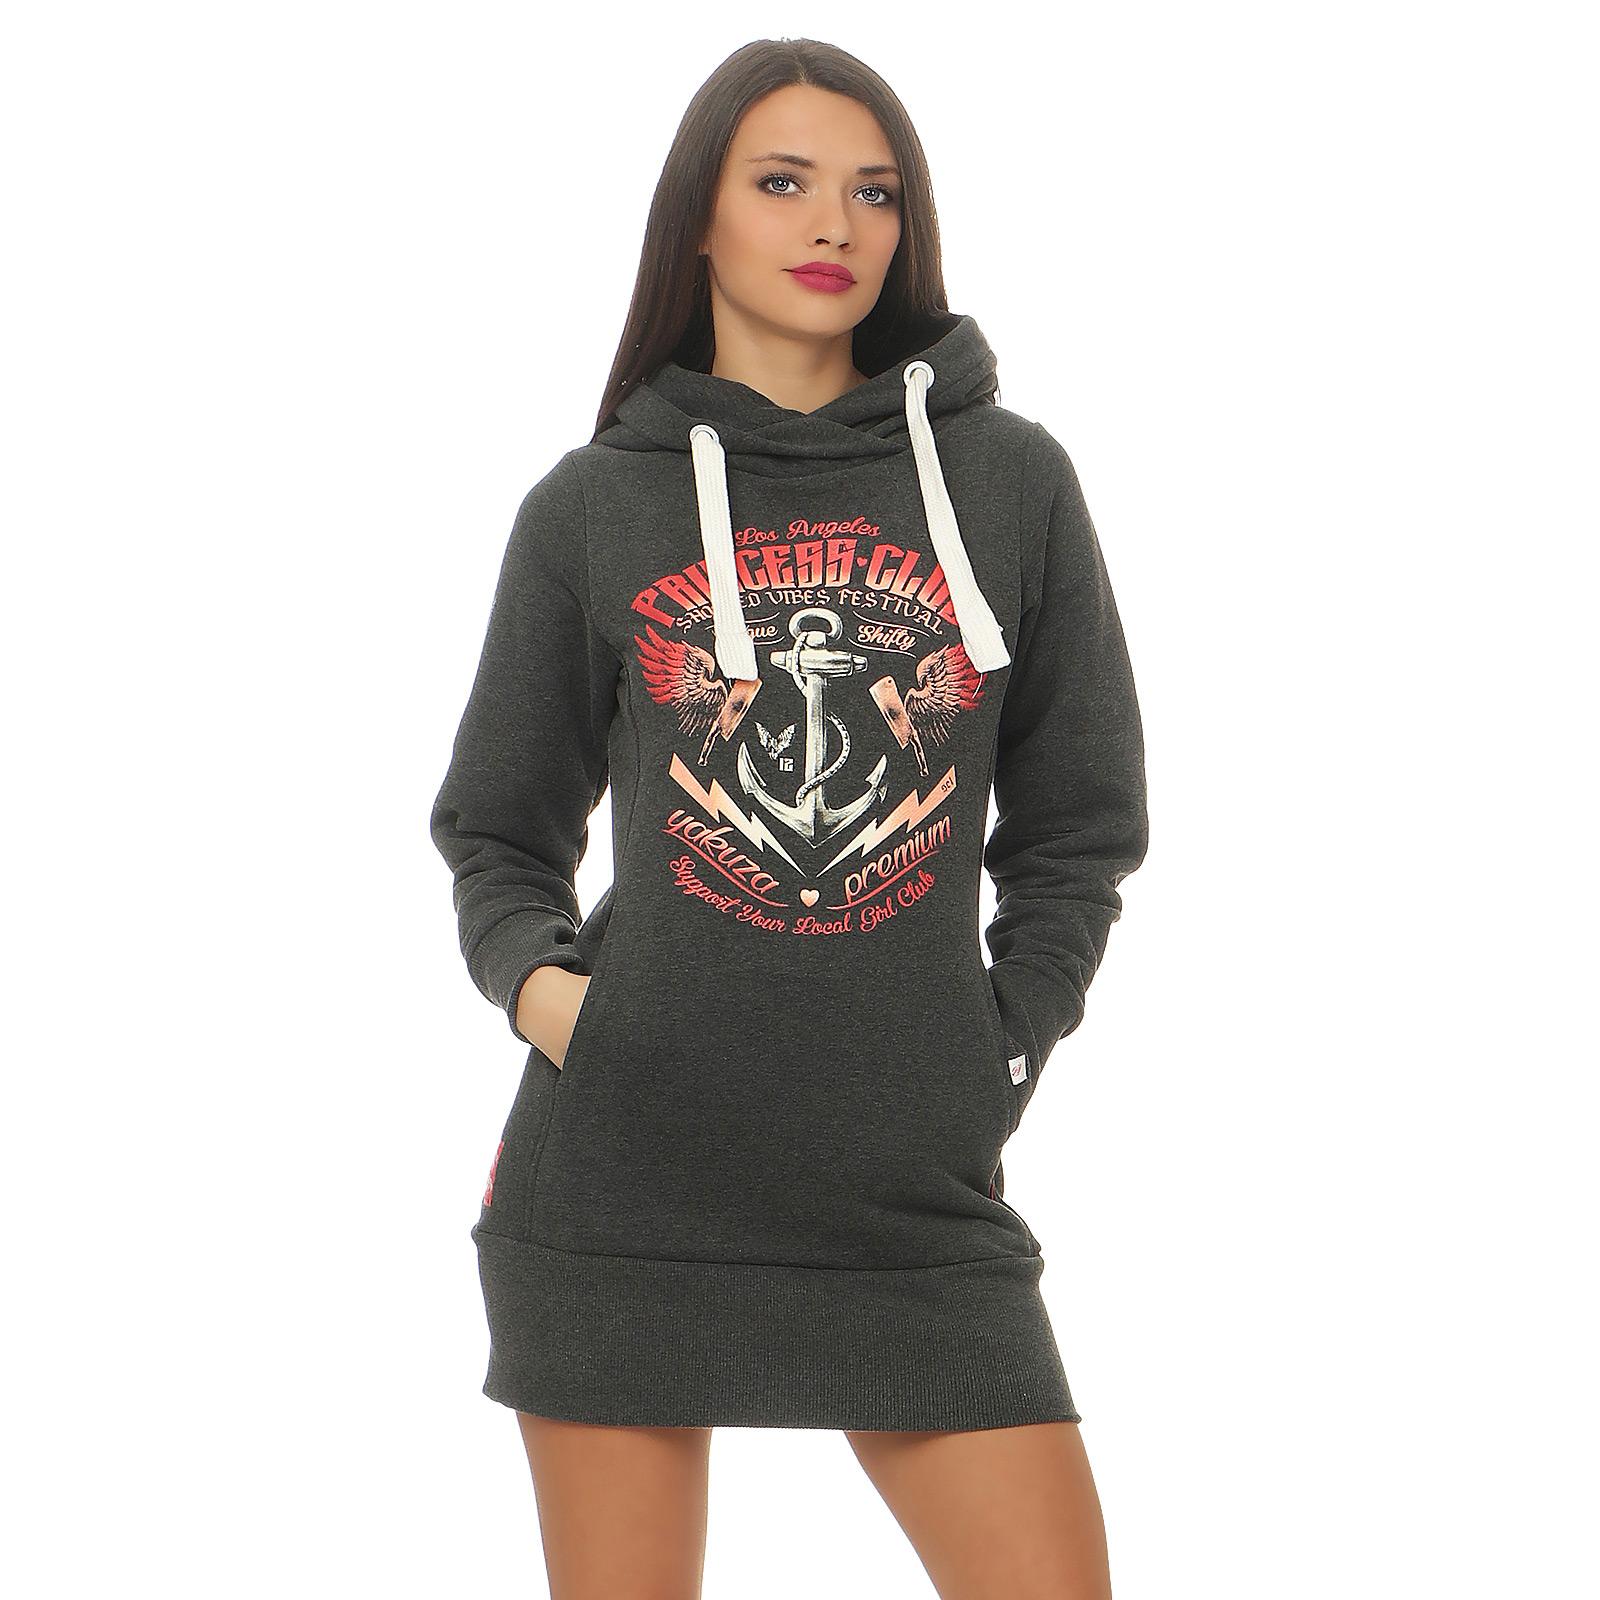 Yakuza Premium Women Long Sweatshirt GH 2443 anthra SPECIALS WOMEN ... 6cce0013b84